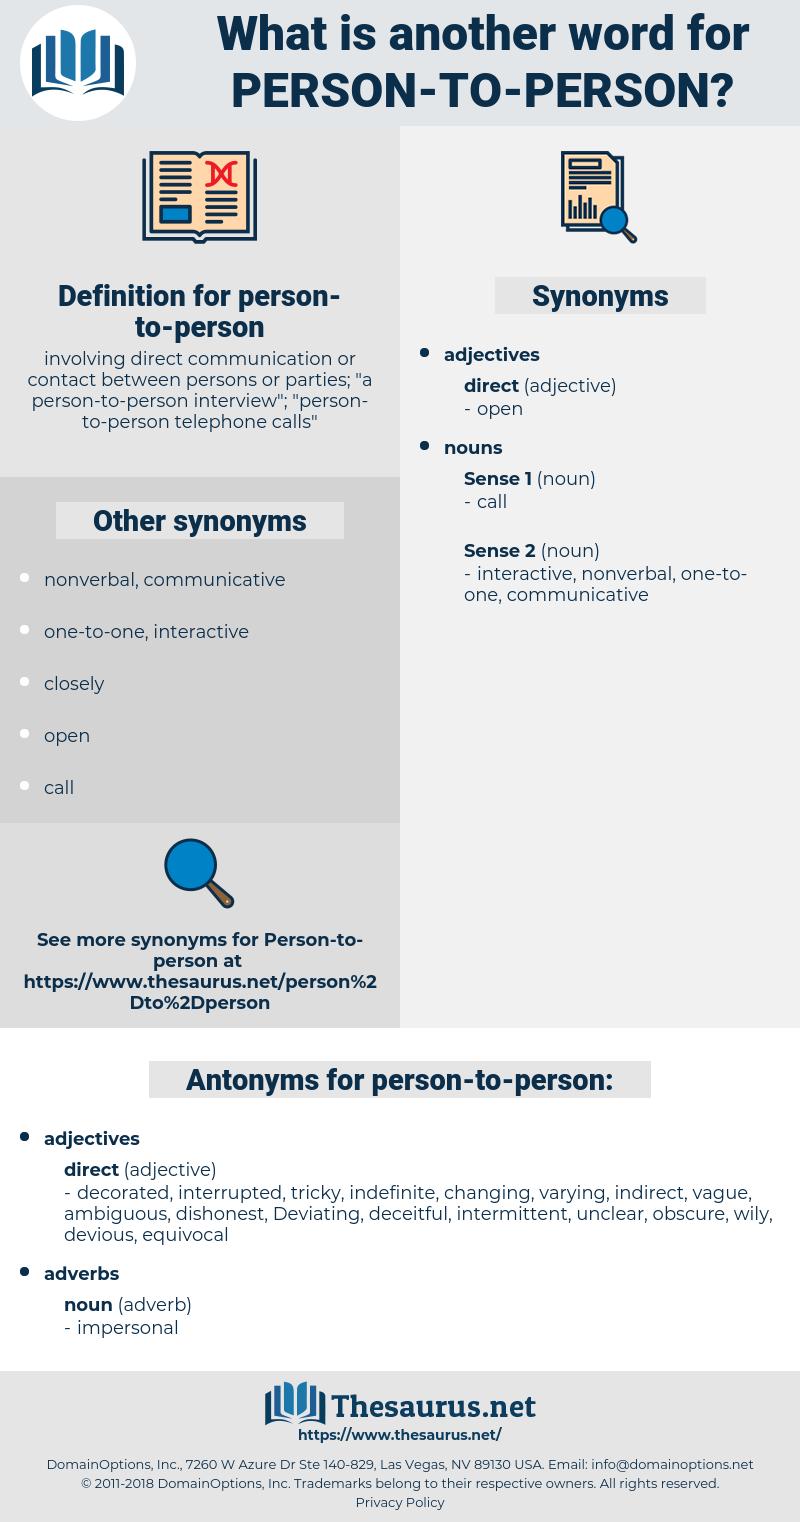 person-to-person, synonym person-to-person, another word for person-to-person, words like person-to-person, thesaurus person-to-person